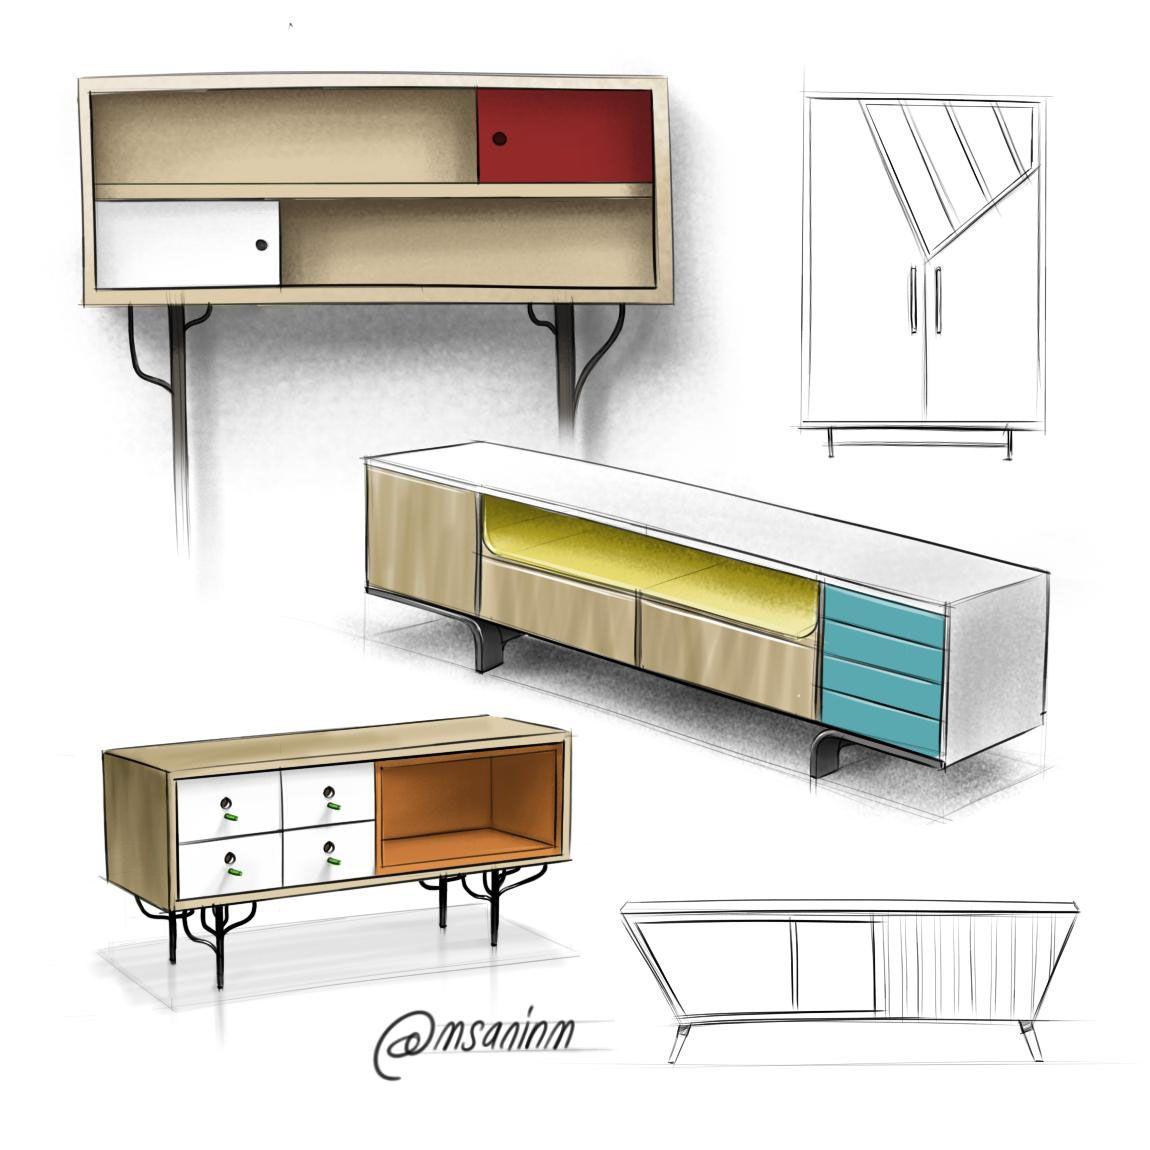 Industrial design sketches furniture - Explore Blog Designs Furniture Design And More